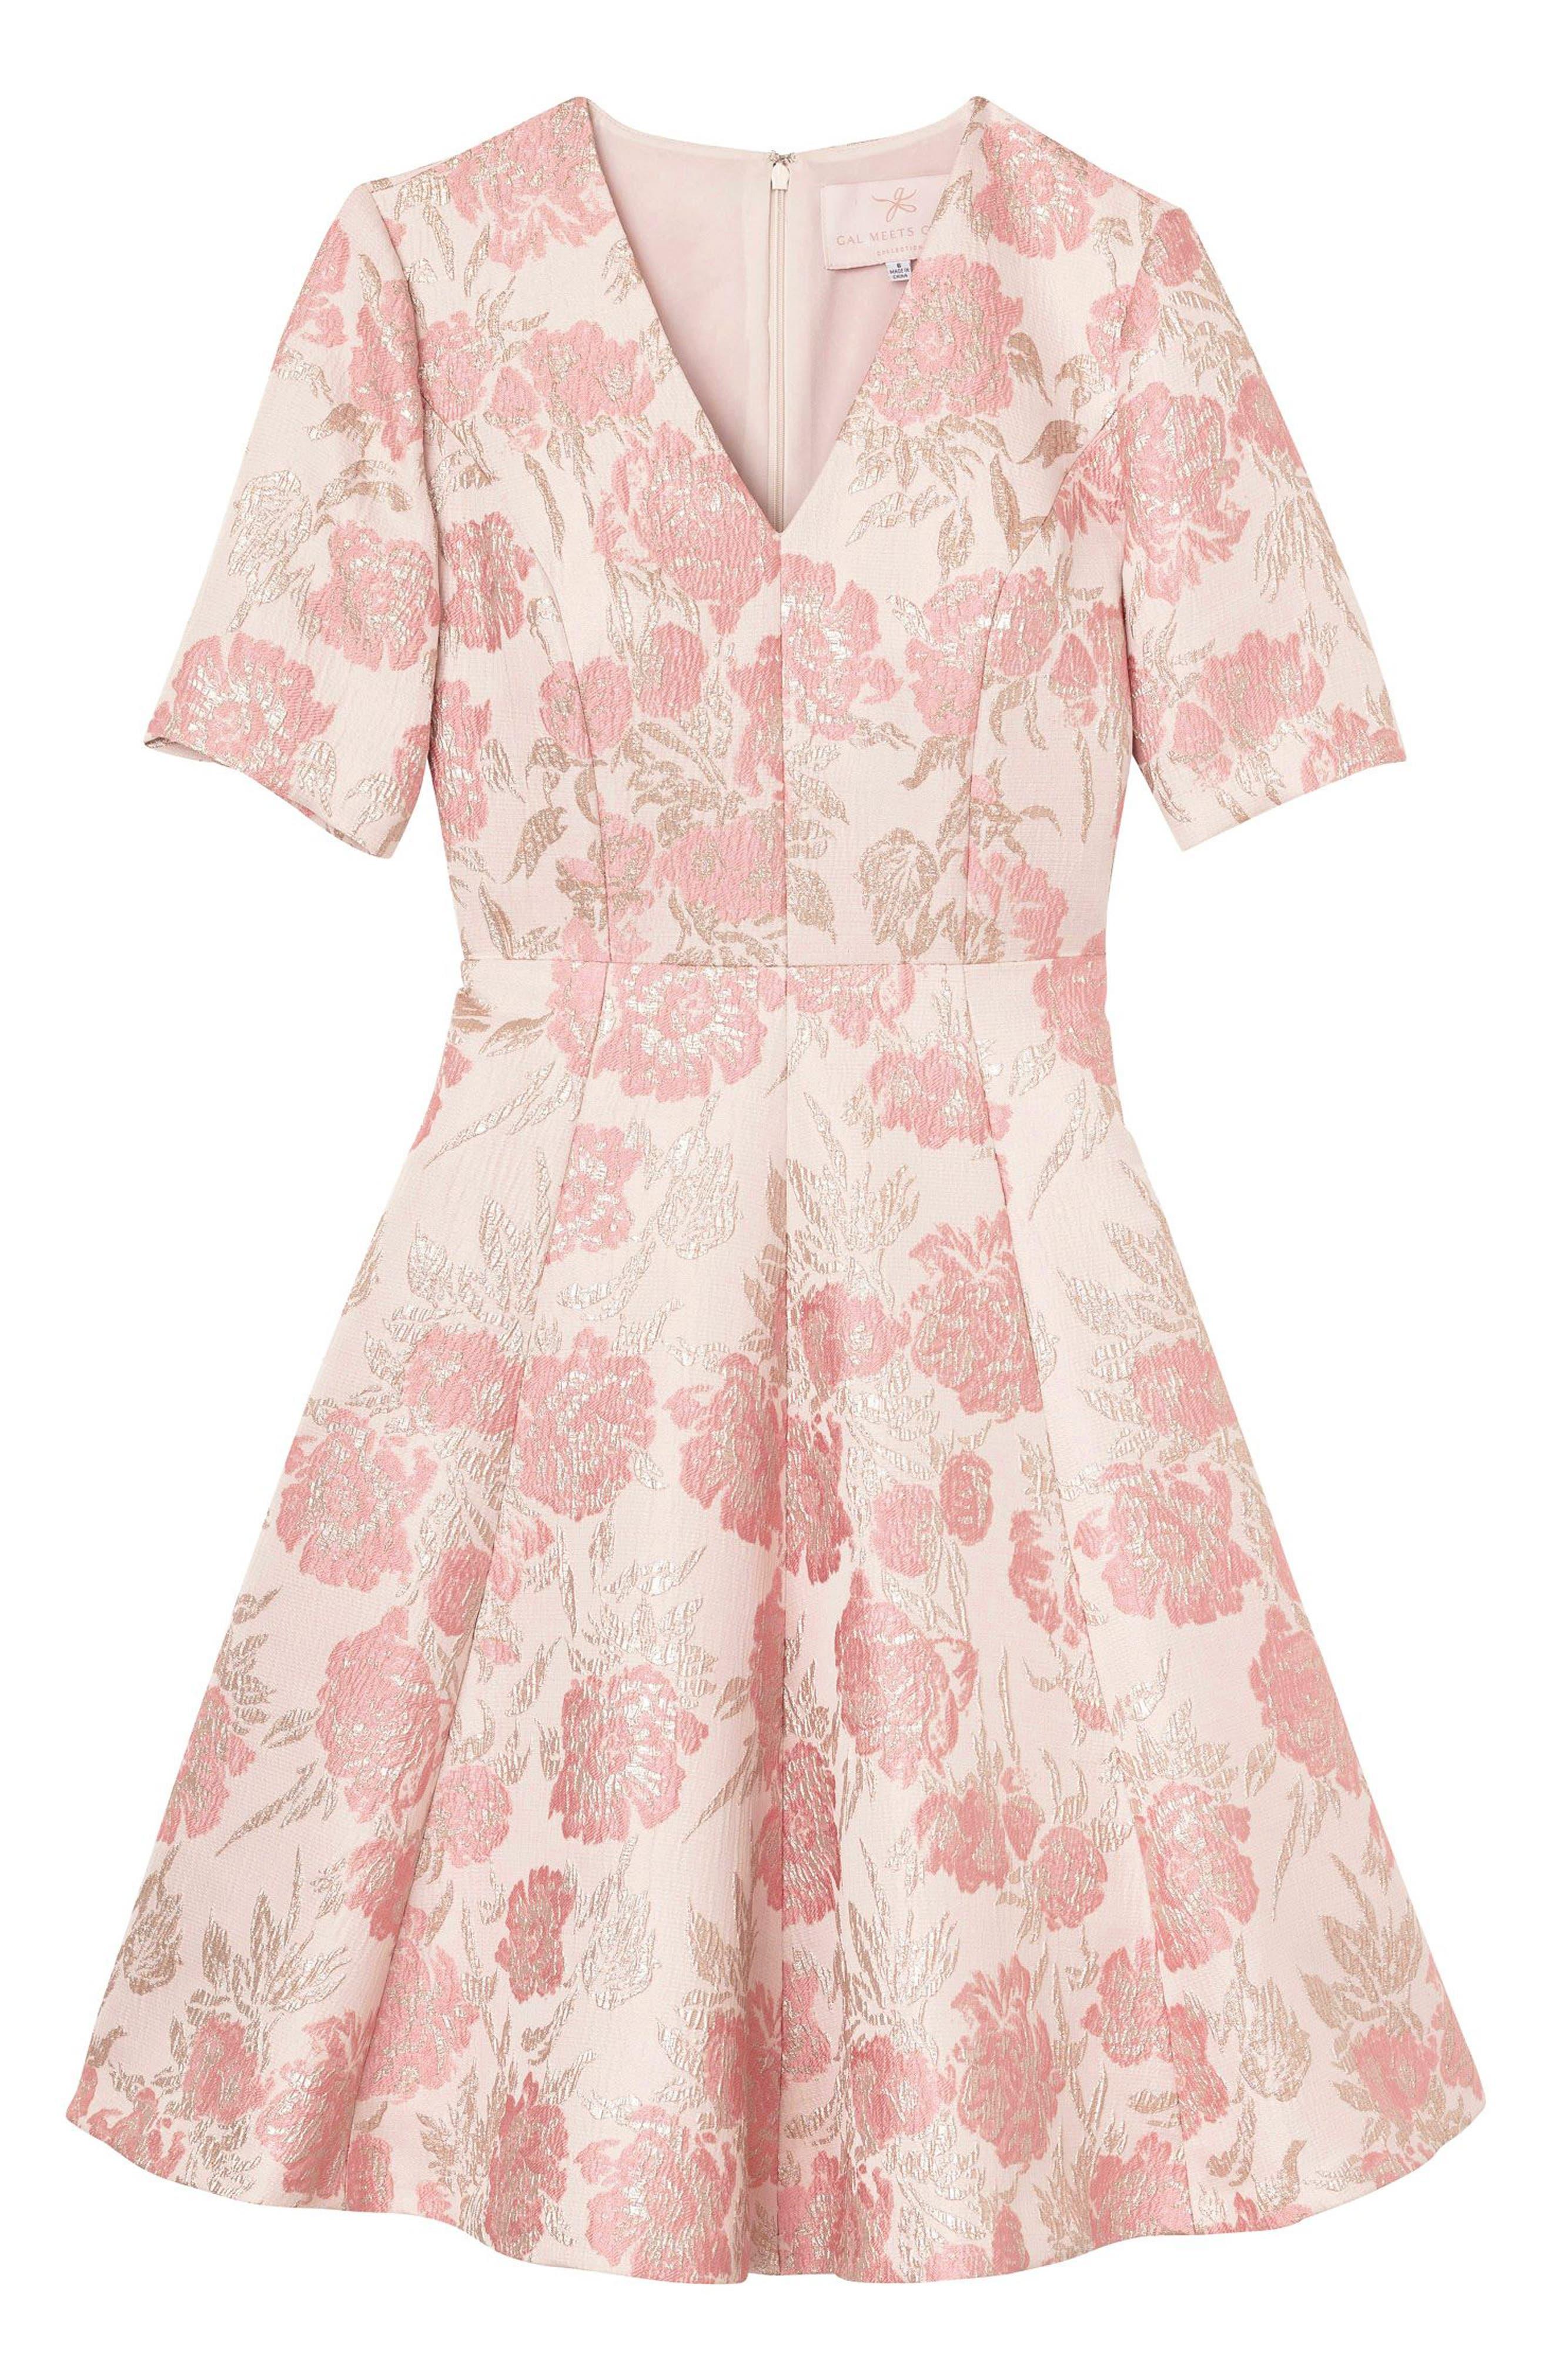 Adair Pink Passion Rose Jacquard Fit & Flare Dress,                             Alternate thumbnail 7, color,                             PINK PEARL